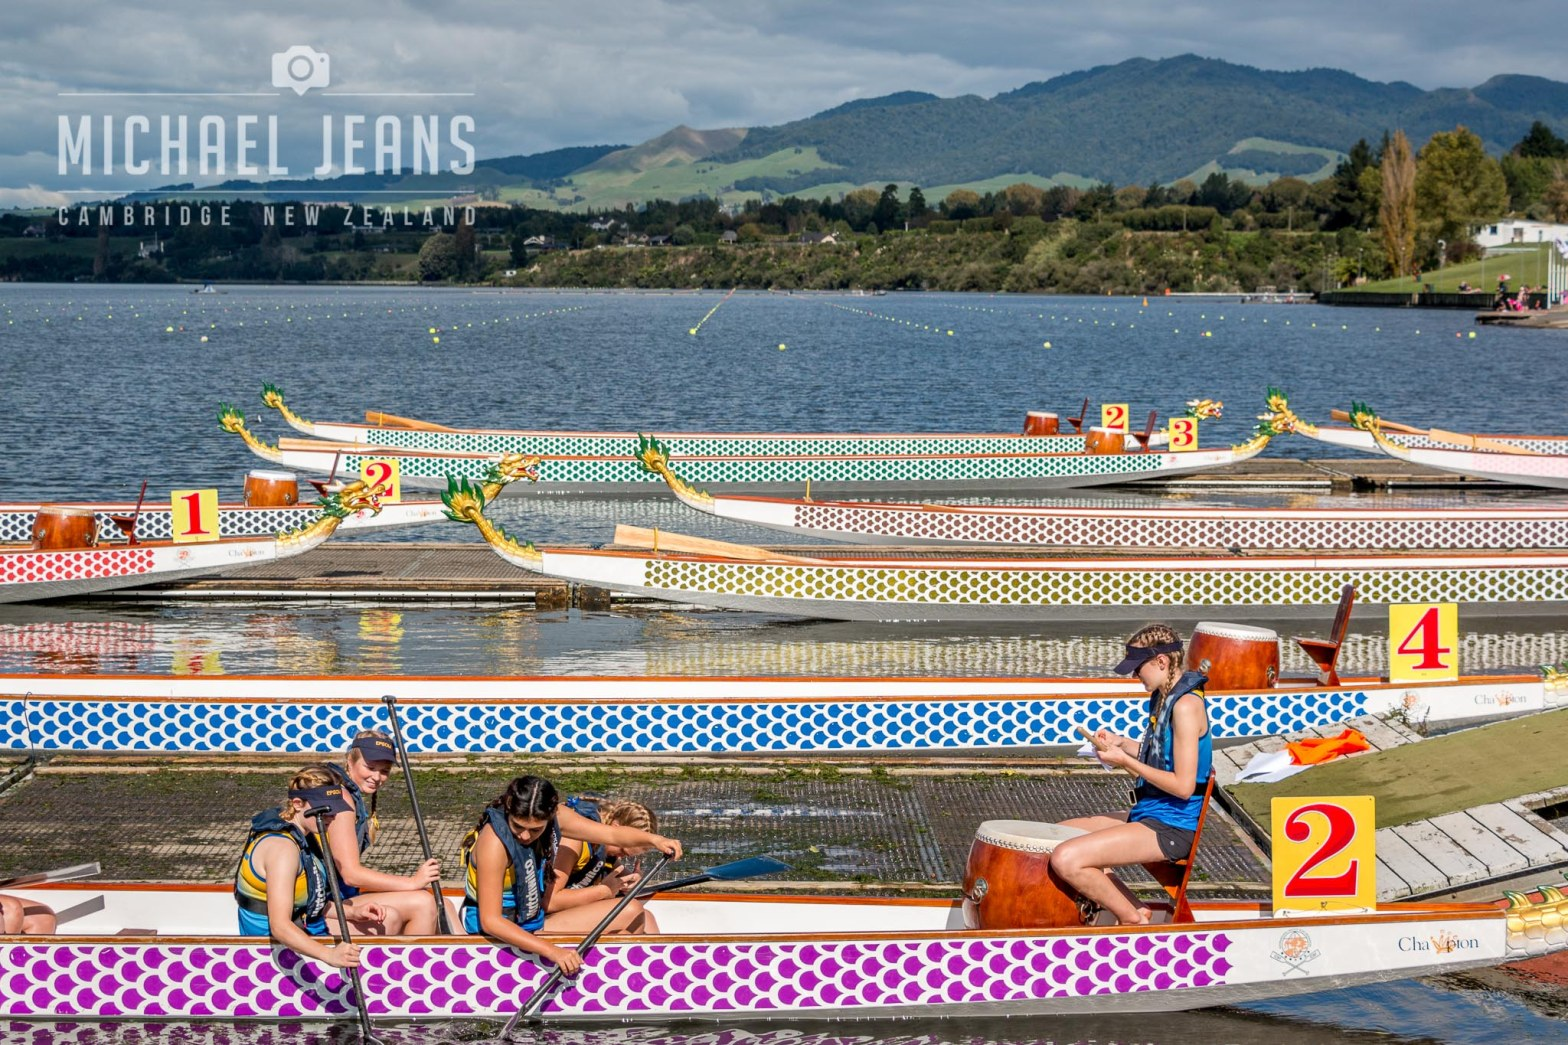 NZDBA Dragonboat National Championship regatta Lake Karapiro April 2017